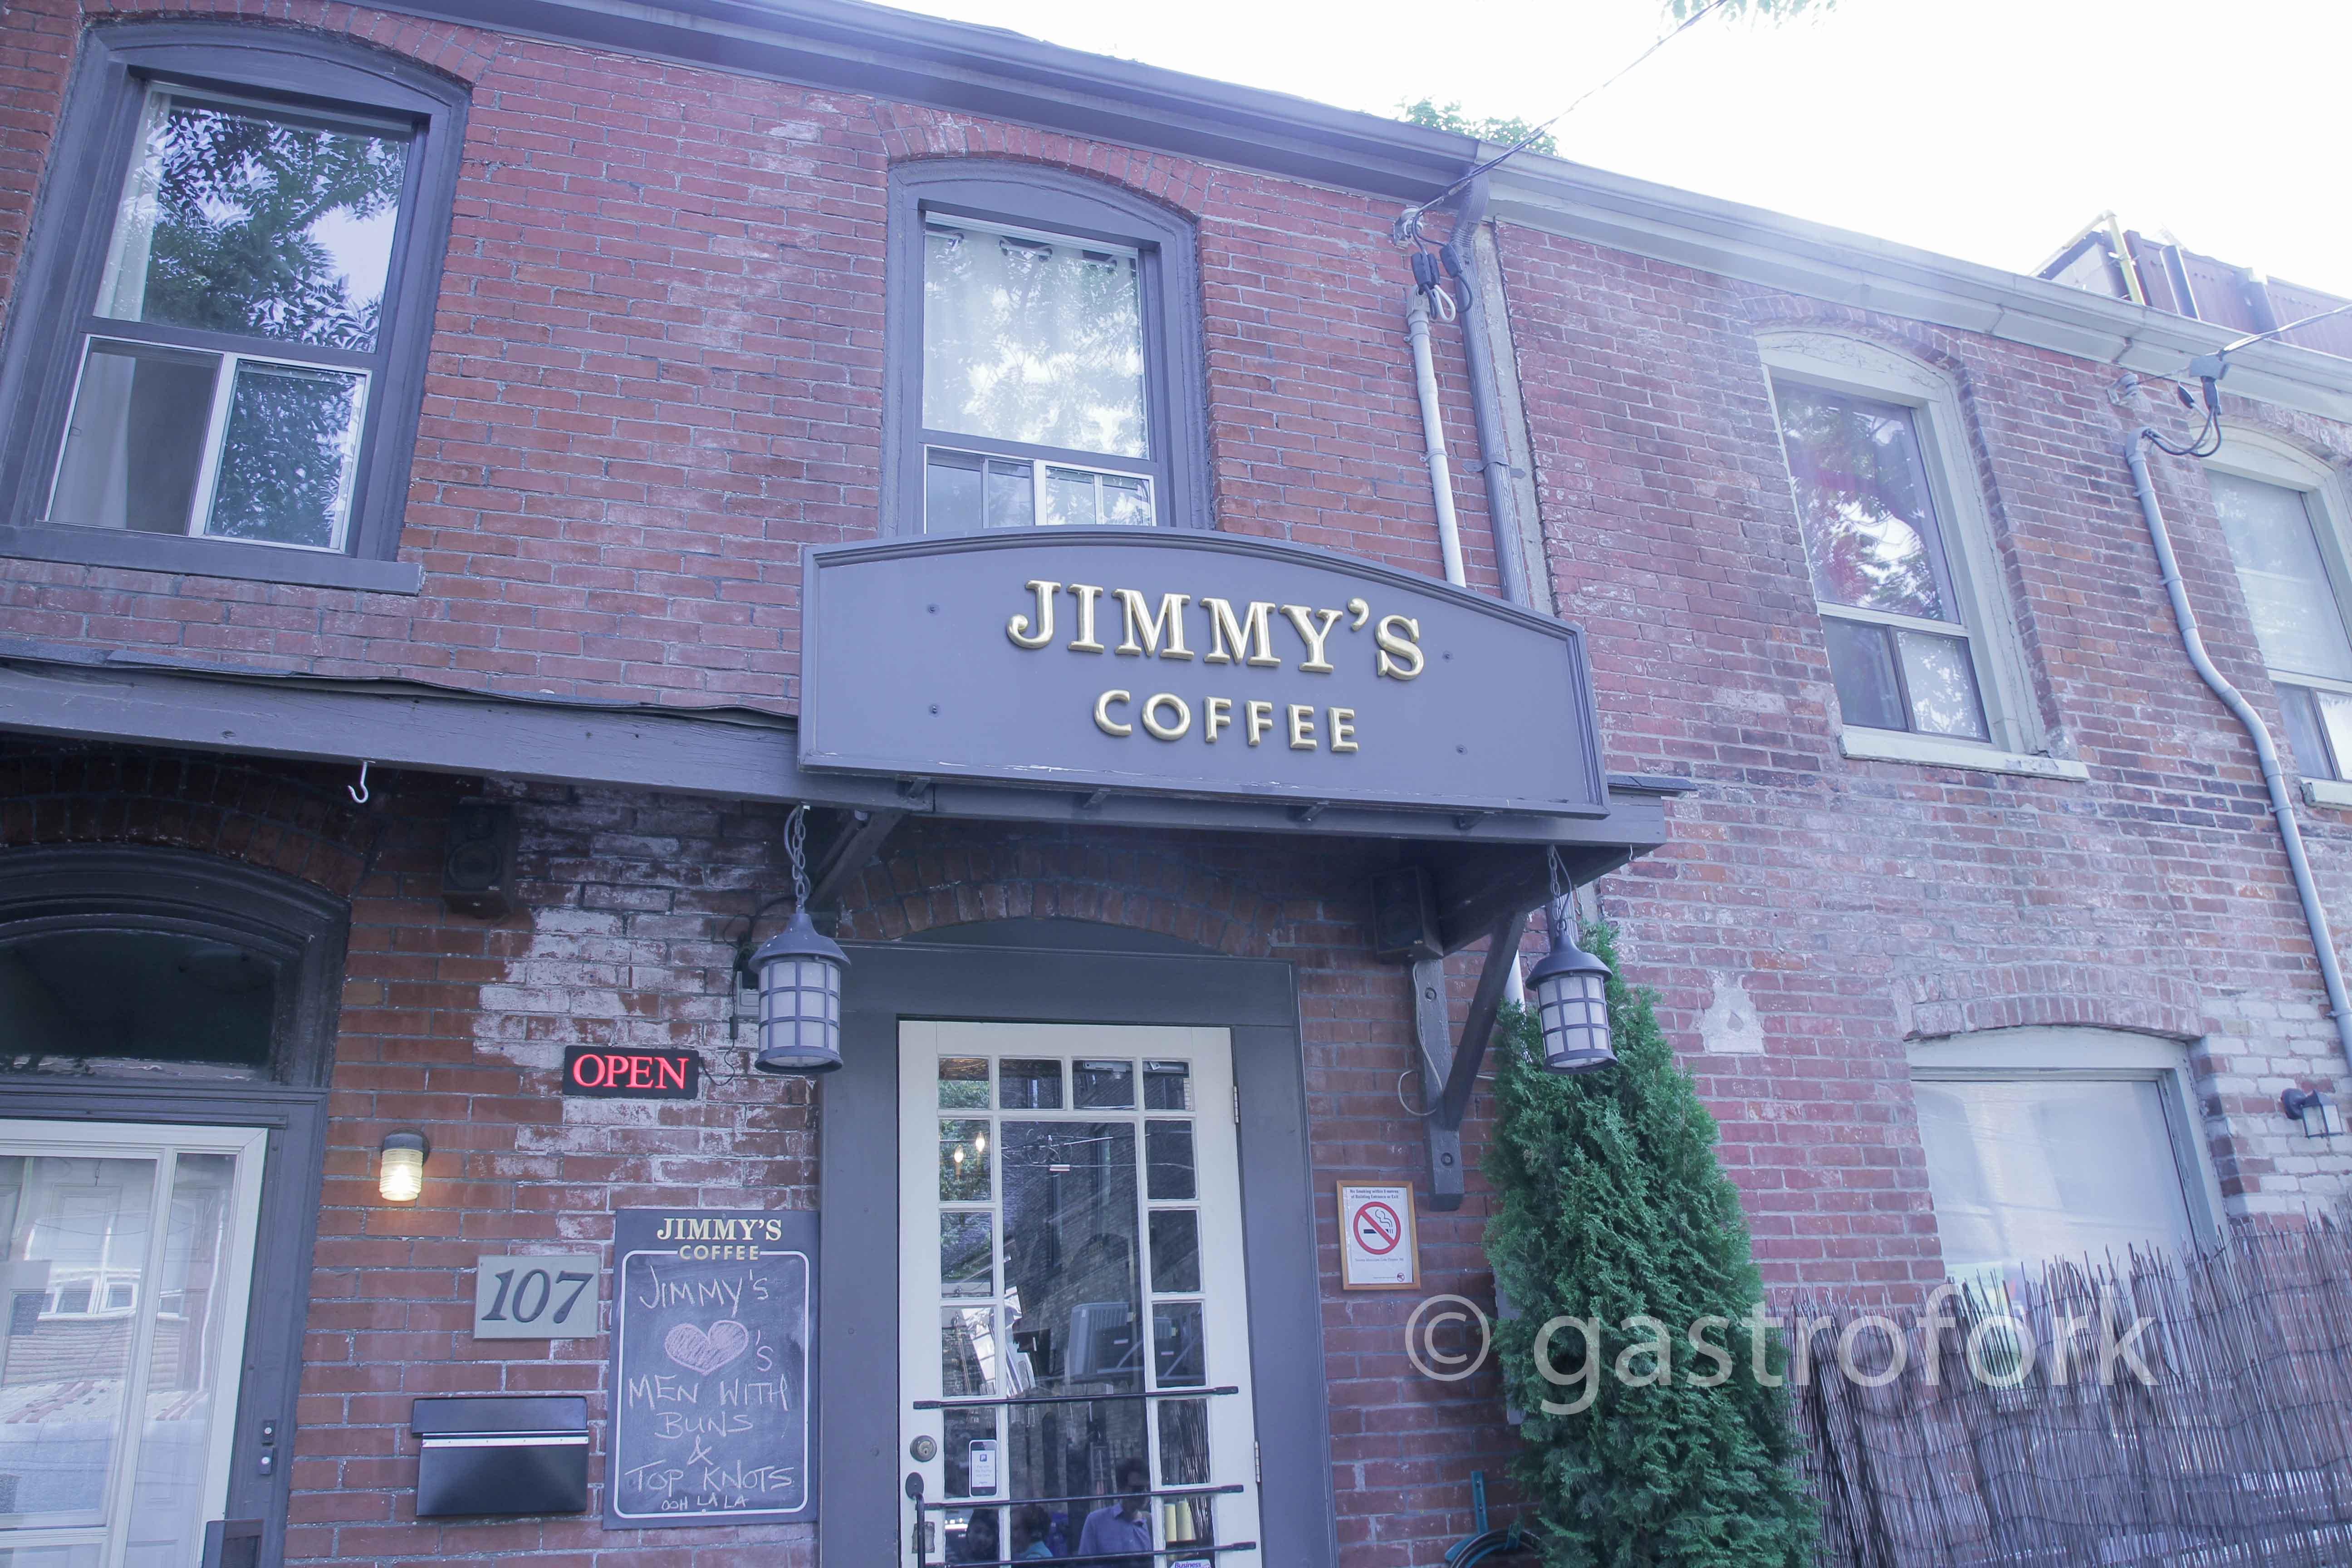 jimmyscoffee-9928